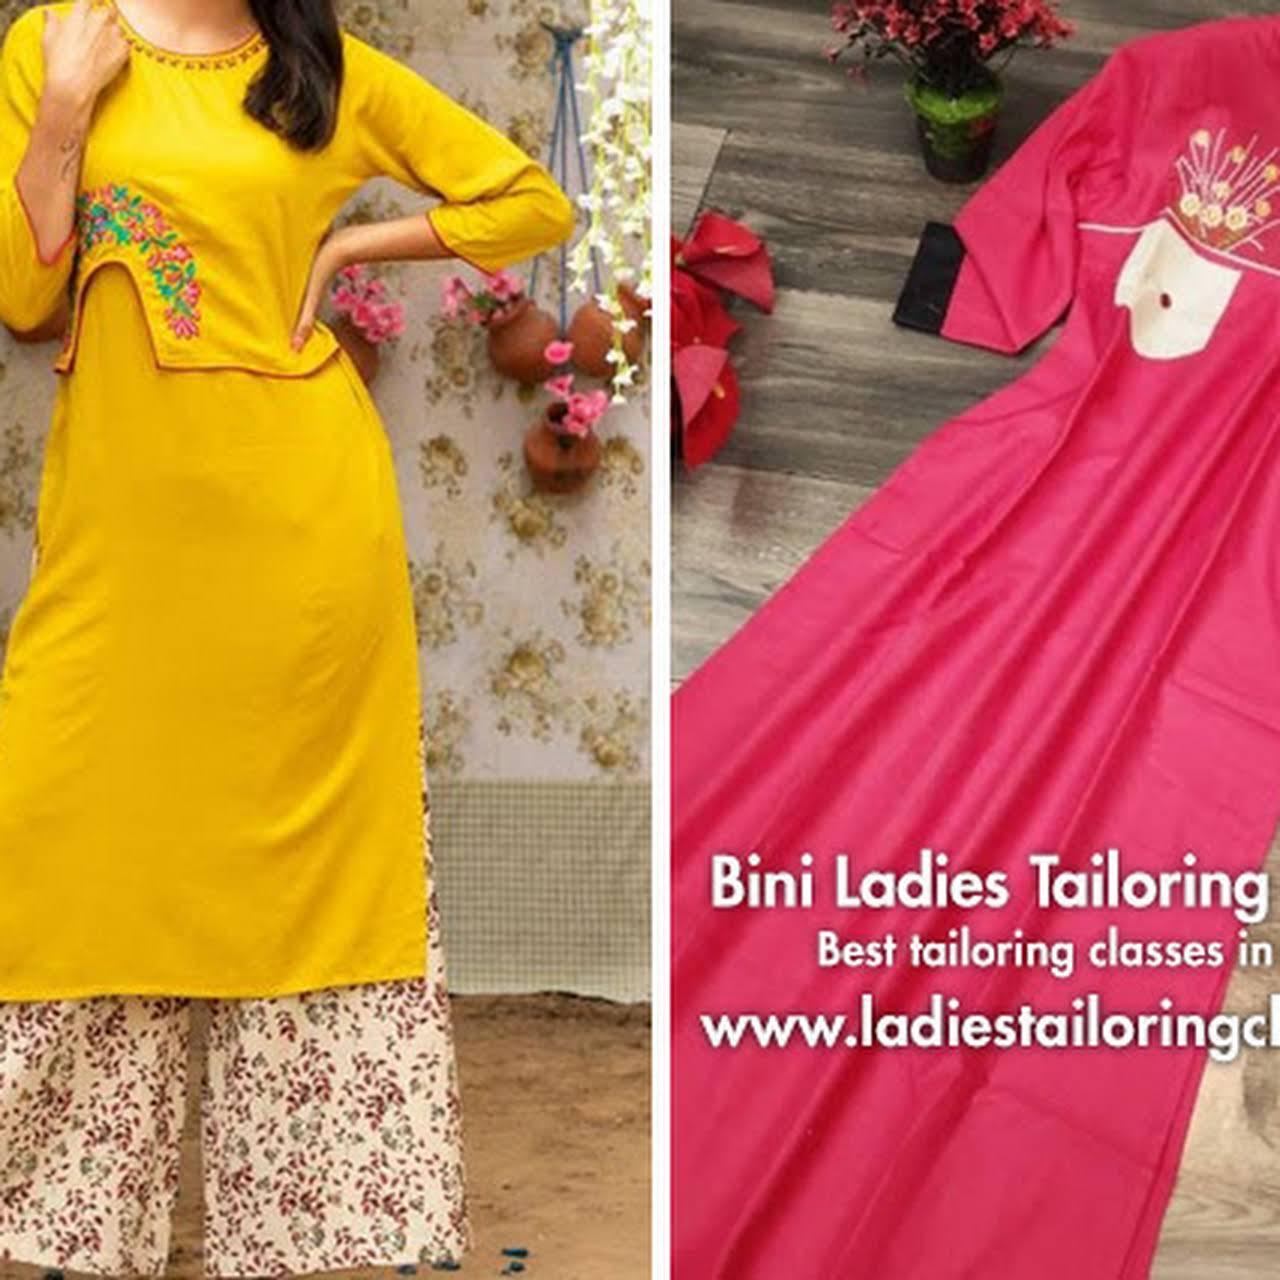 Bini Ladies Tailoring Classes Stitching Class In Bengaluru